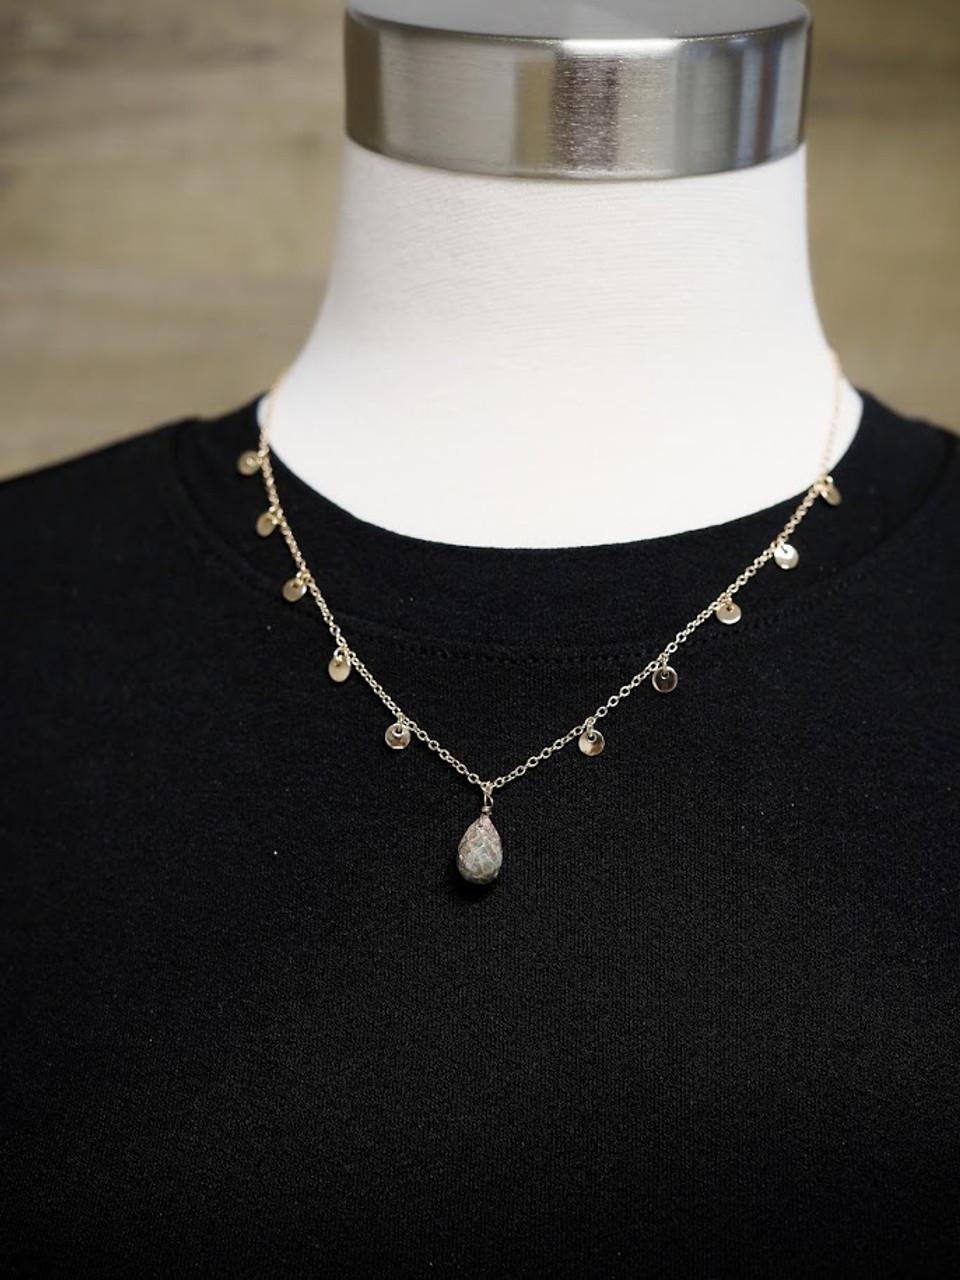 Samantha Short Necklace With Stone Pendant